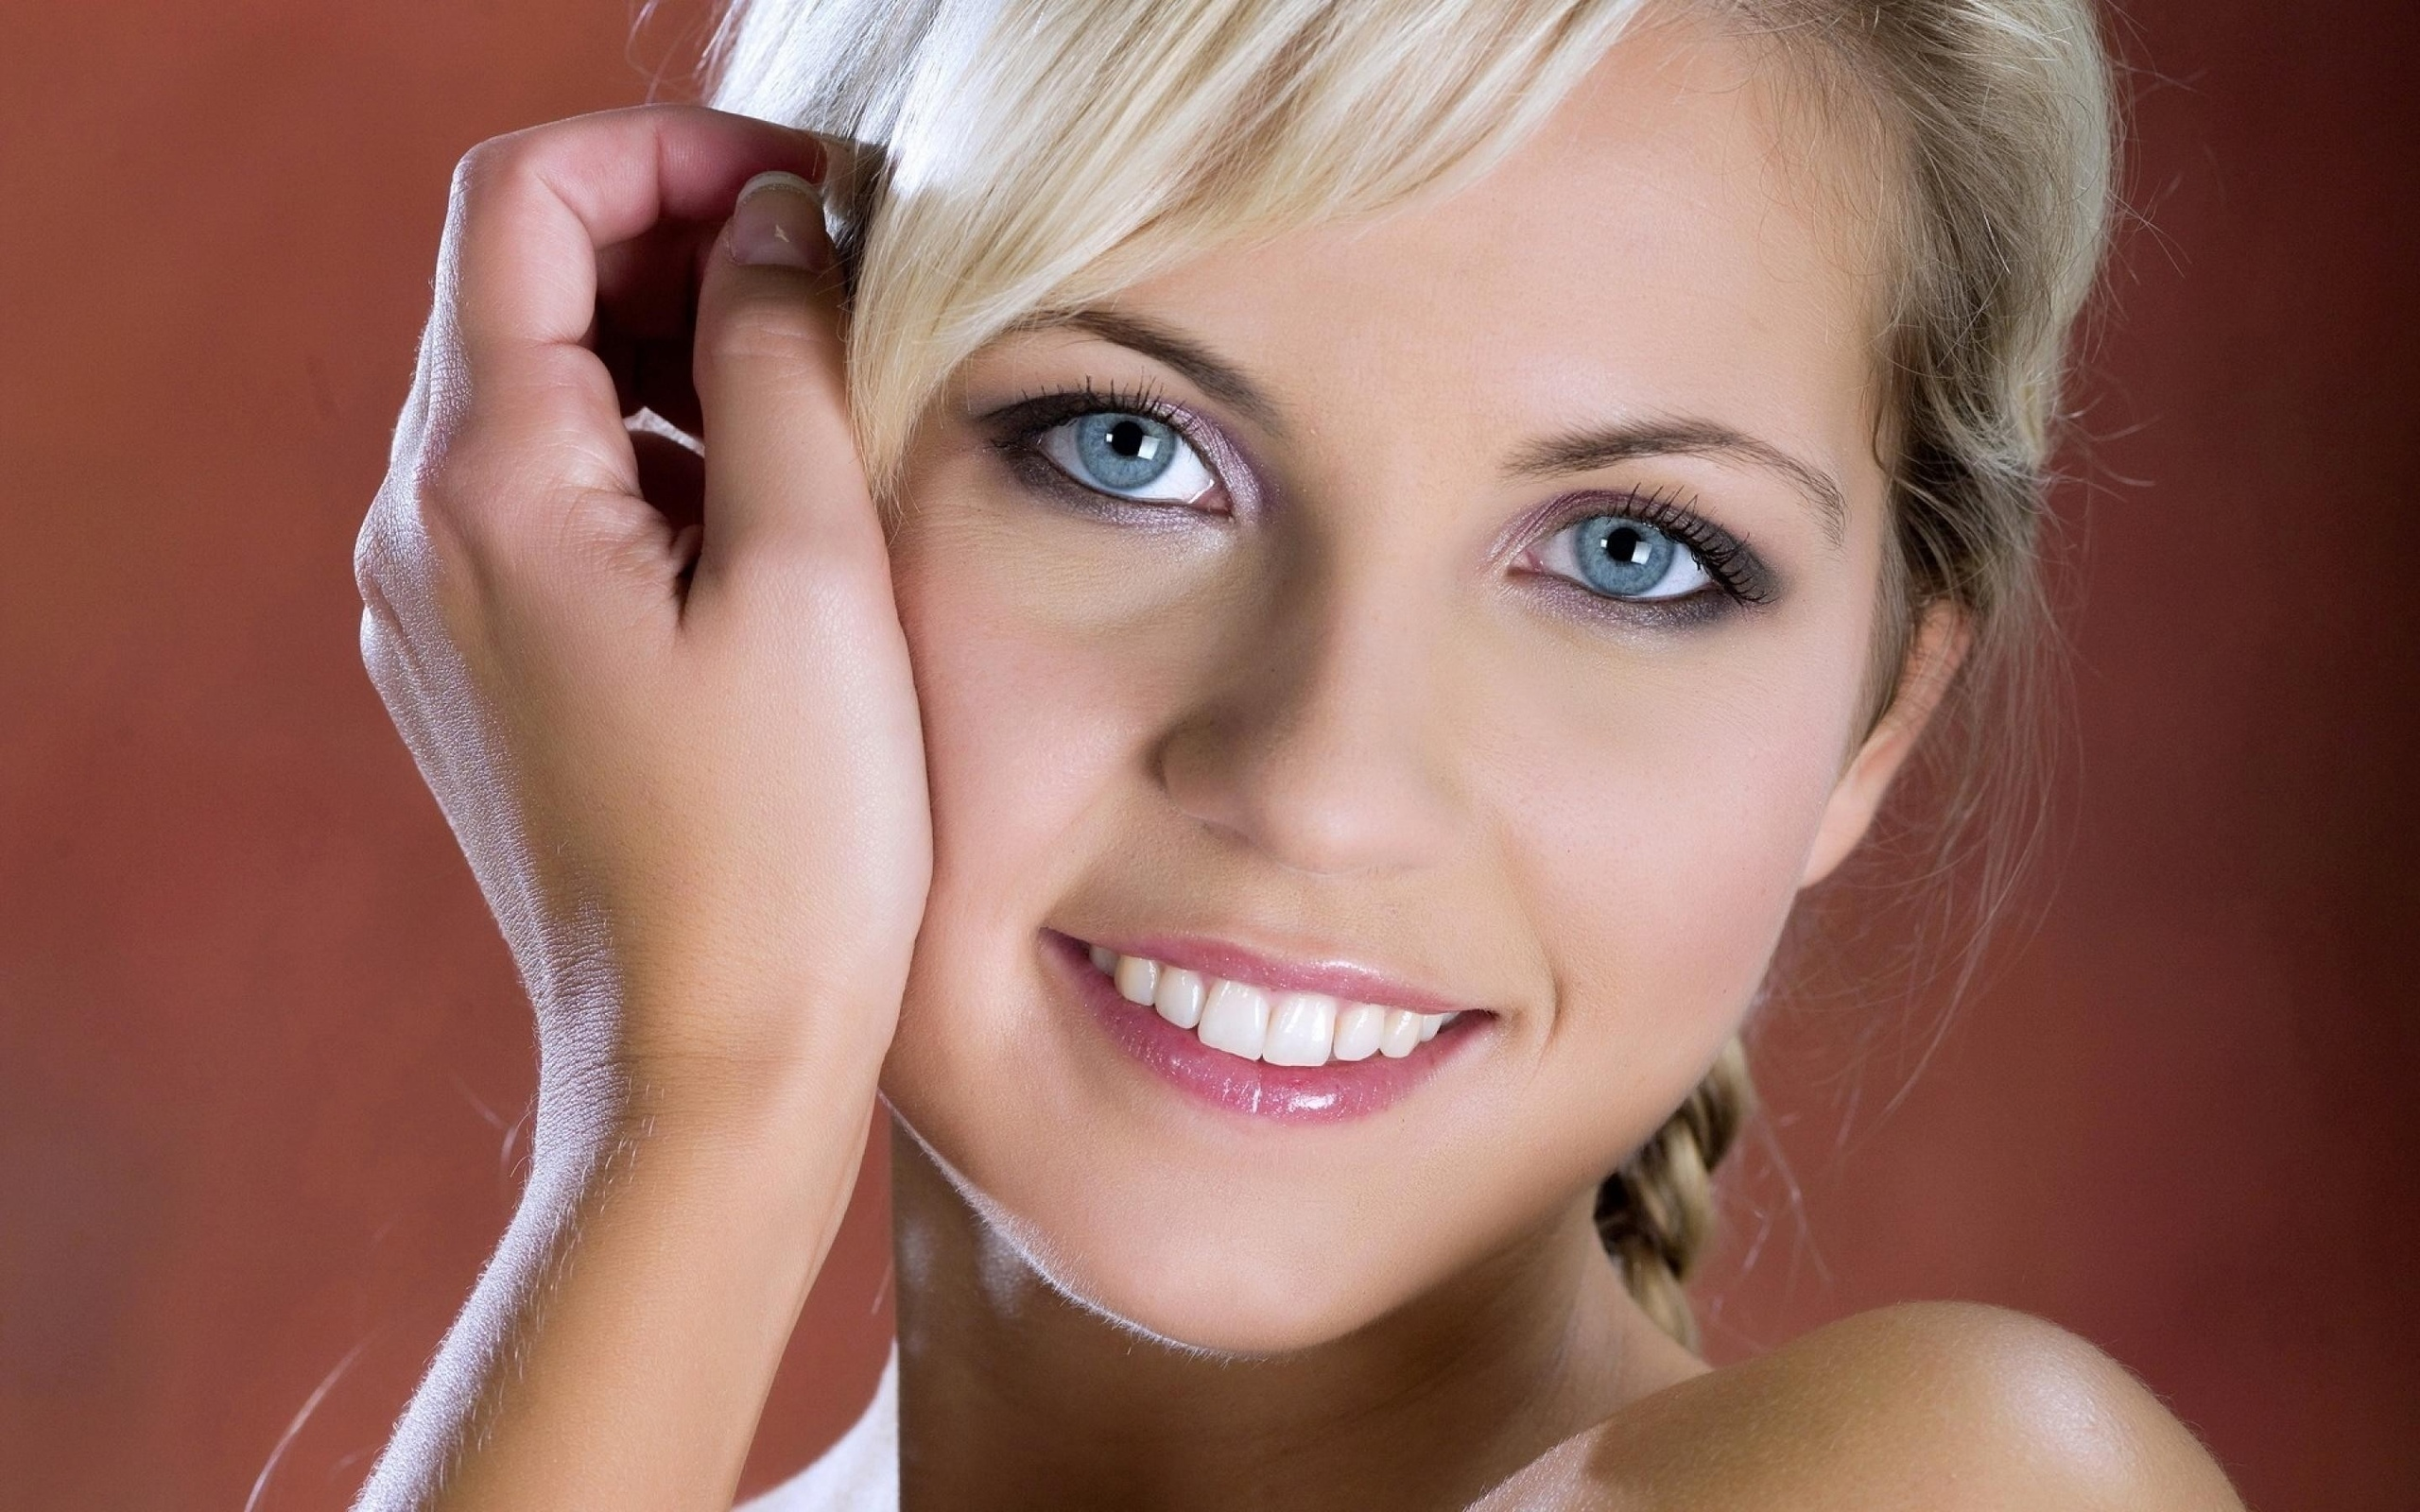 Виновата чукчи, открытки фото блондинки